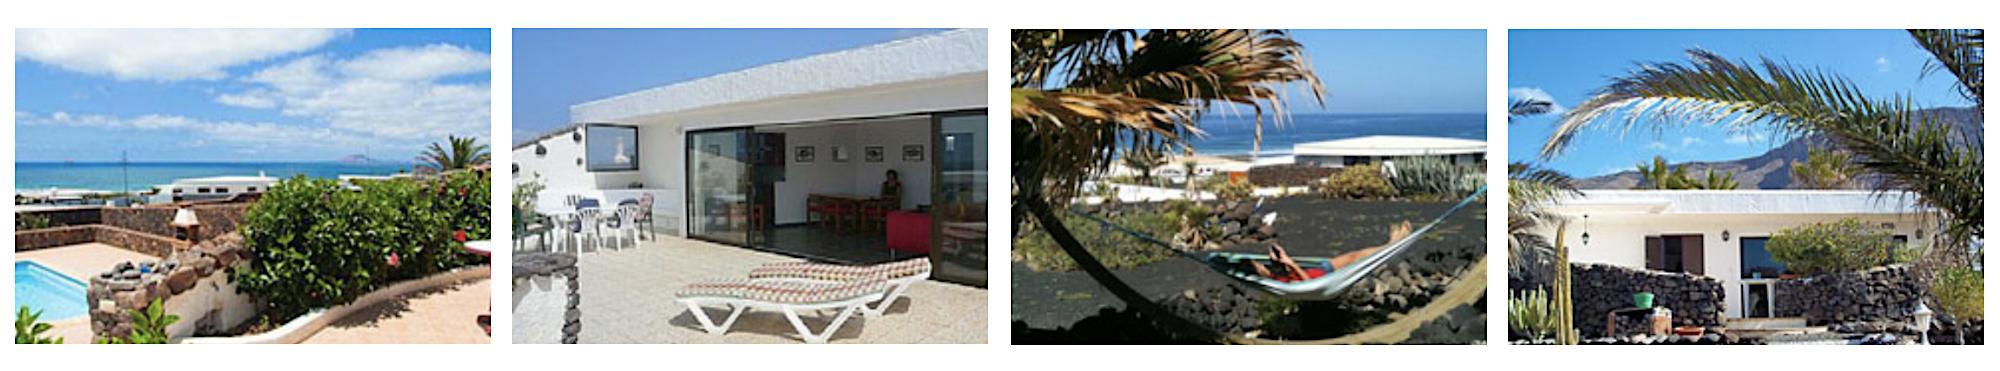 Yogachicas Lanzarote Yoga Retreat